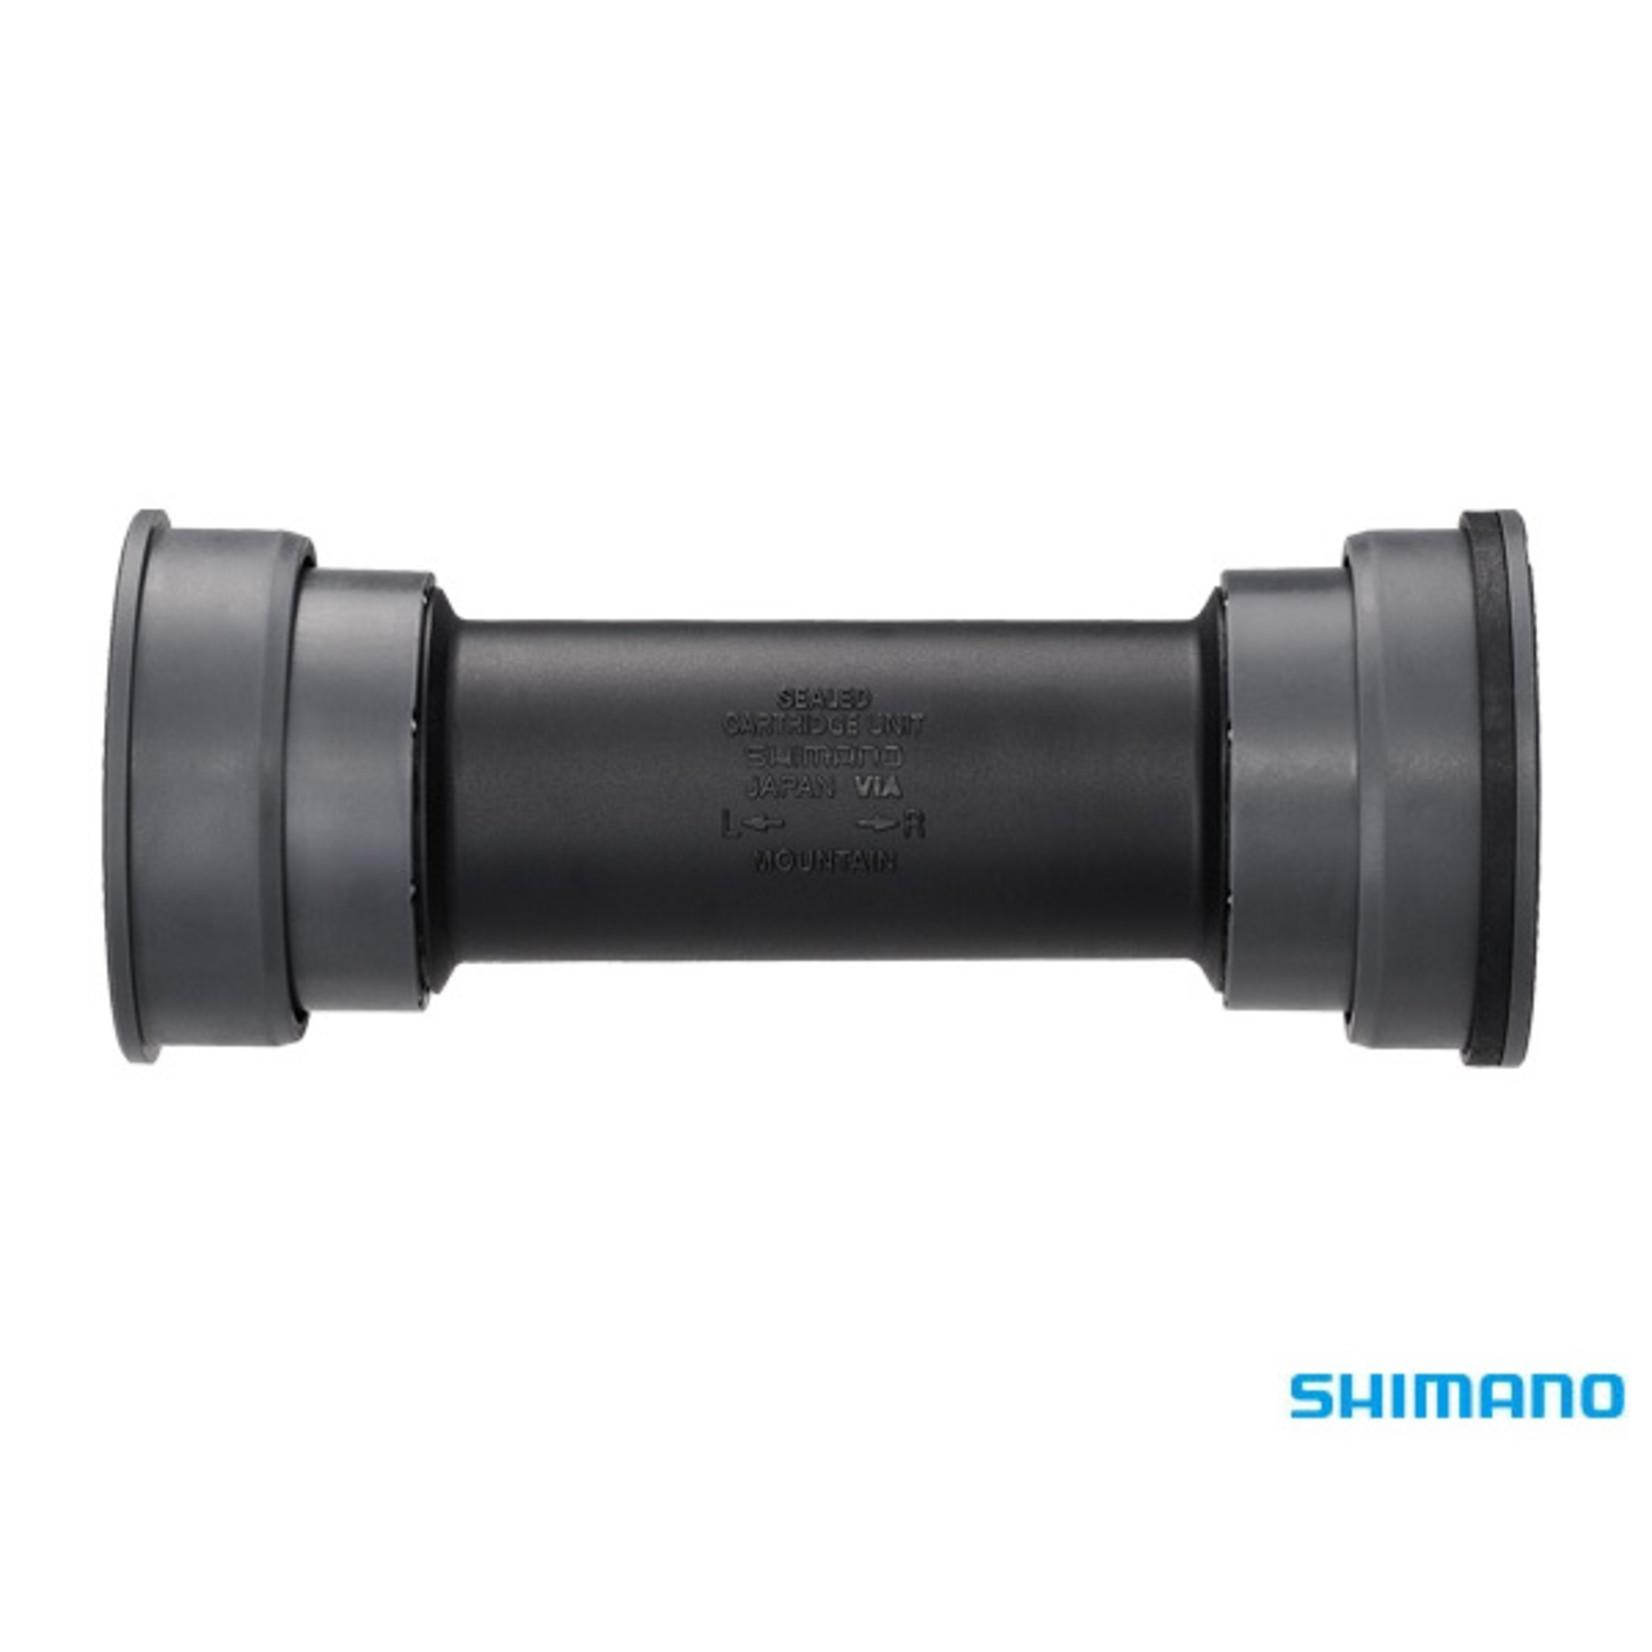 Shimano Shimano, SM-BB71 Bottom Bracket Press-Fit MTB 89.5/92mm